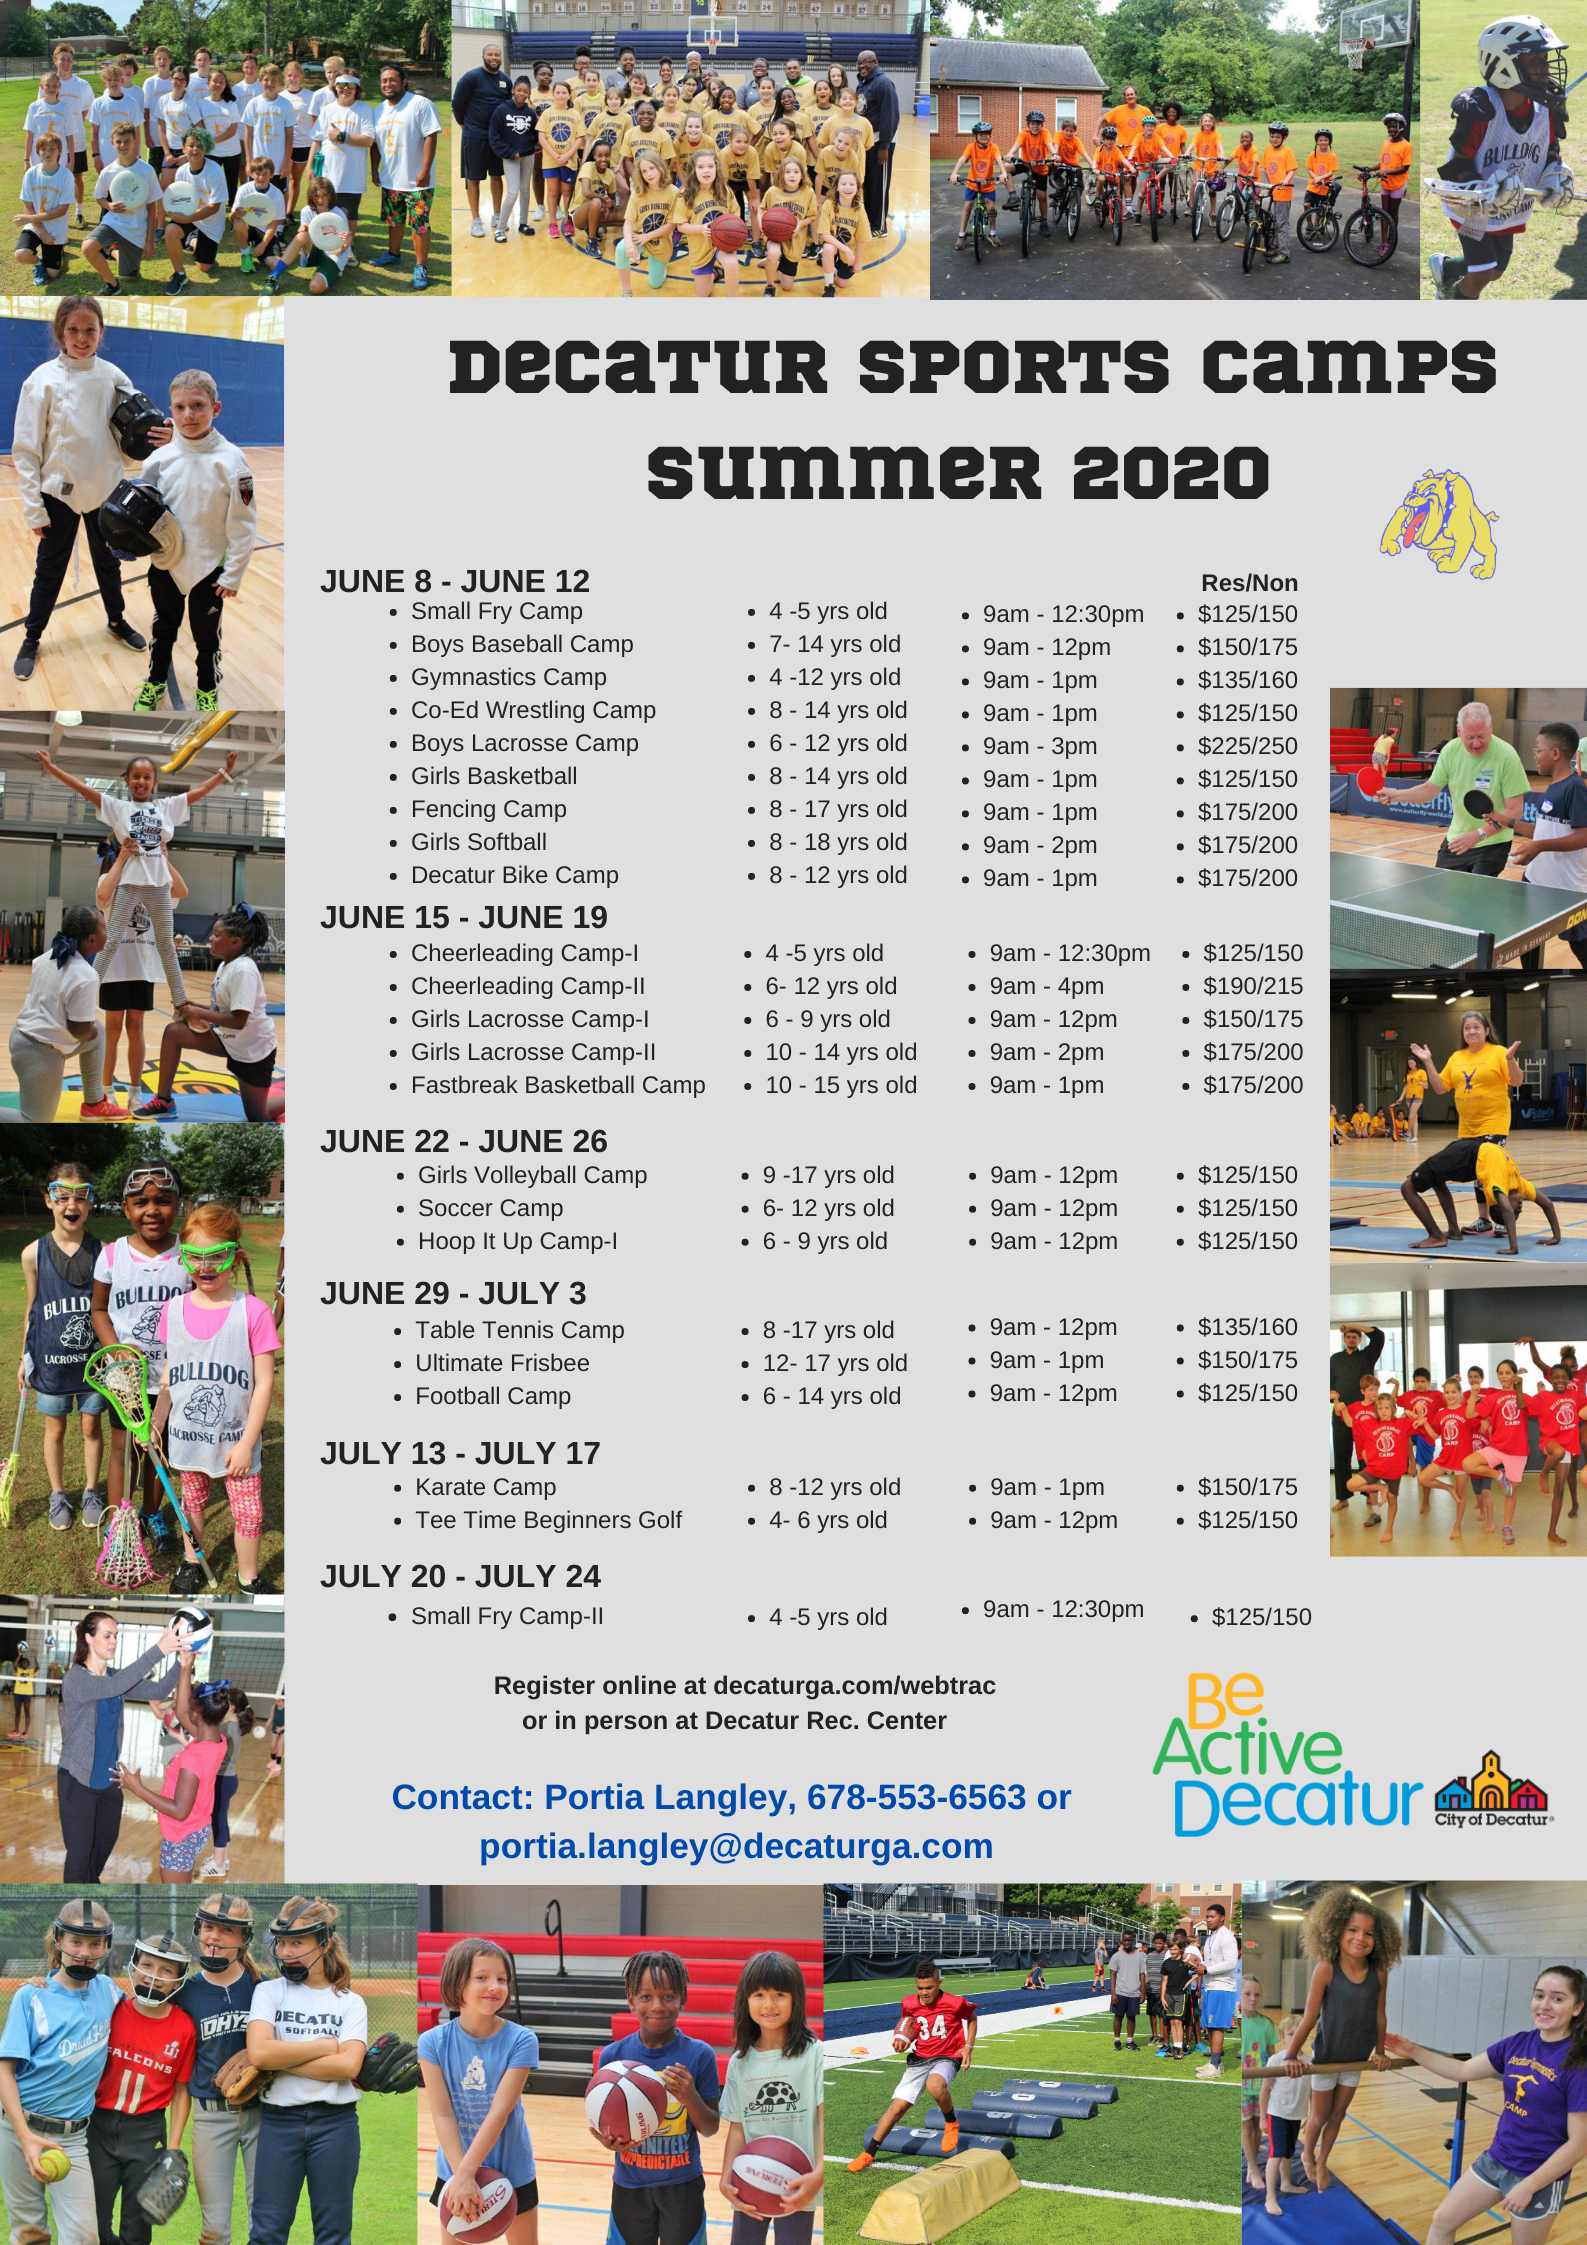 Decatur Sports Camps 2020